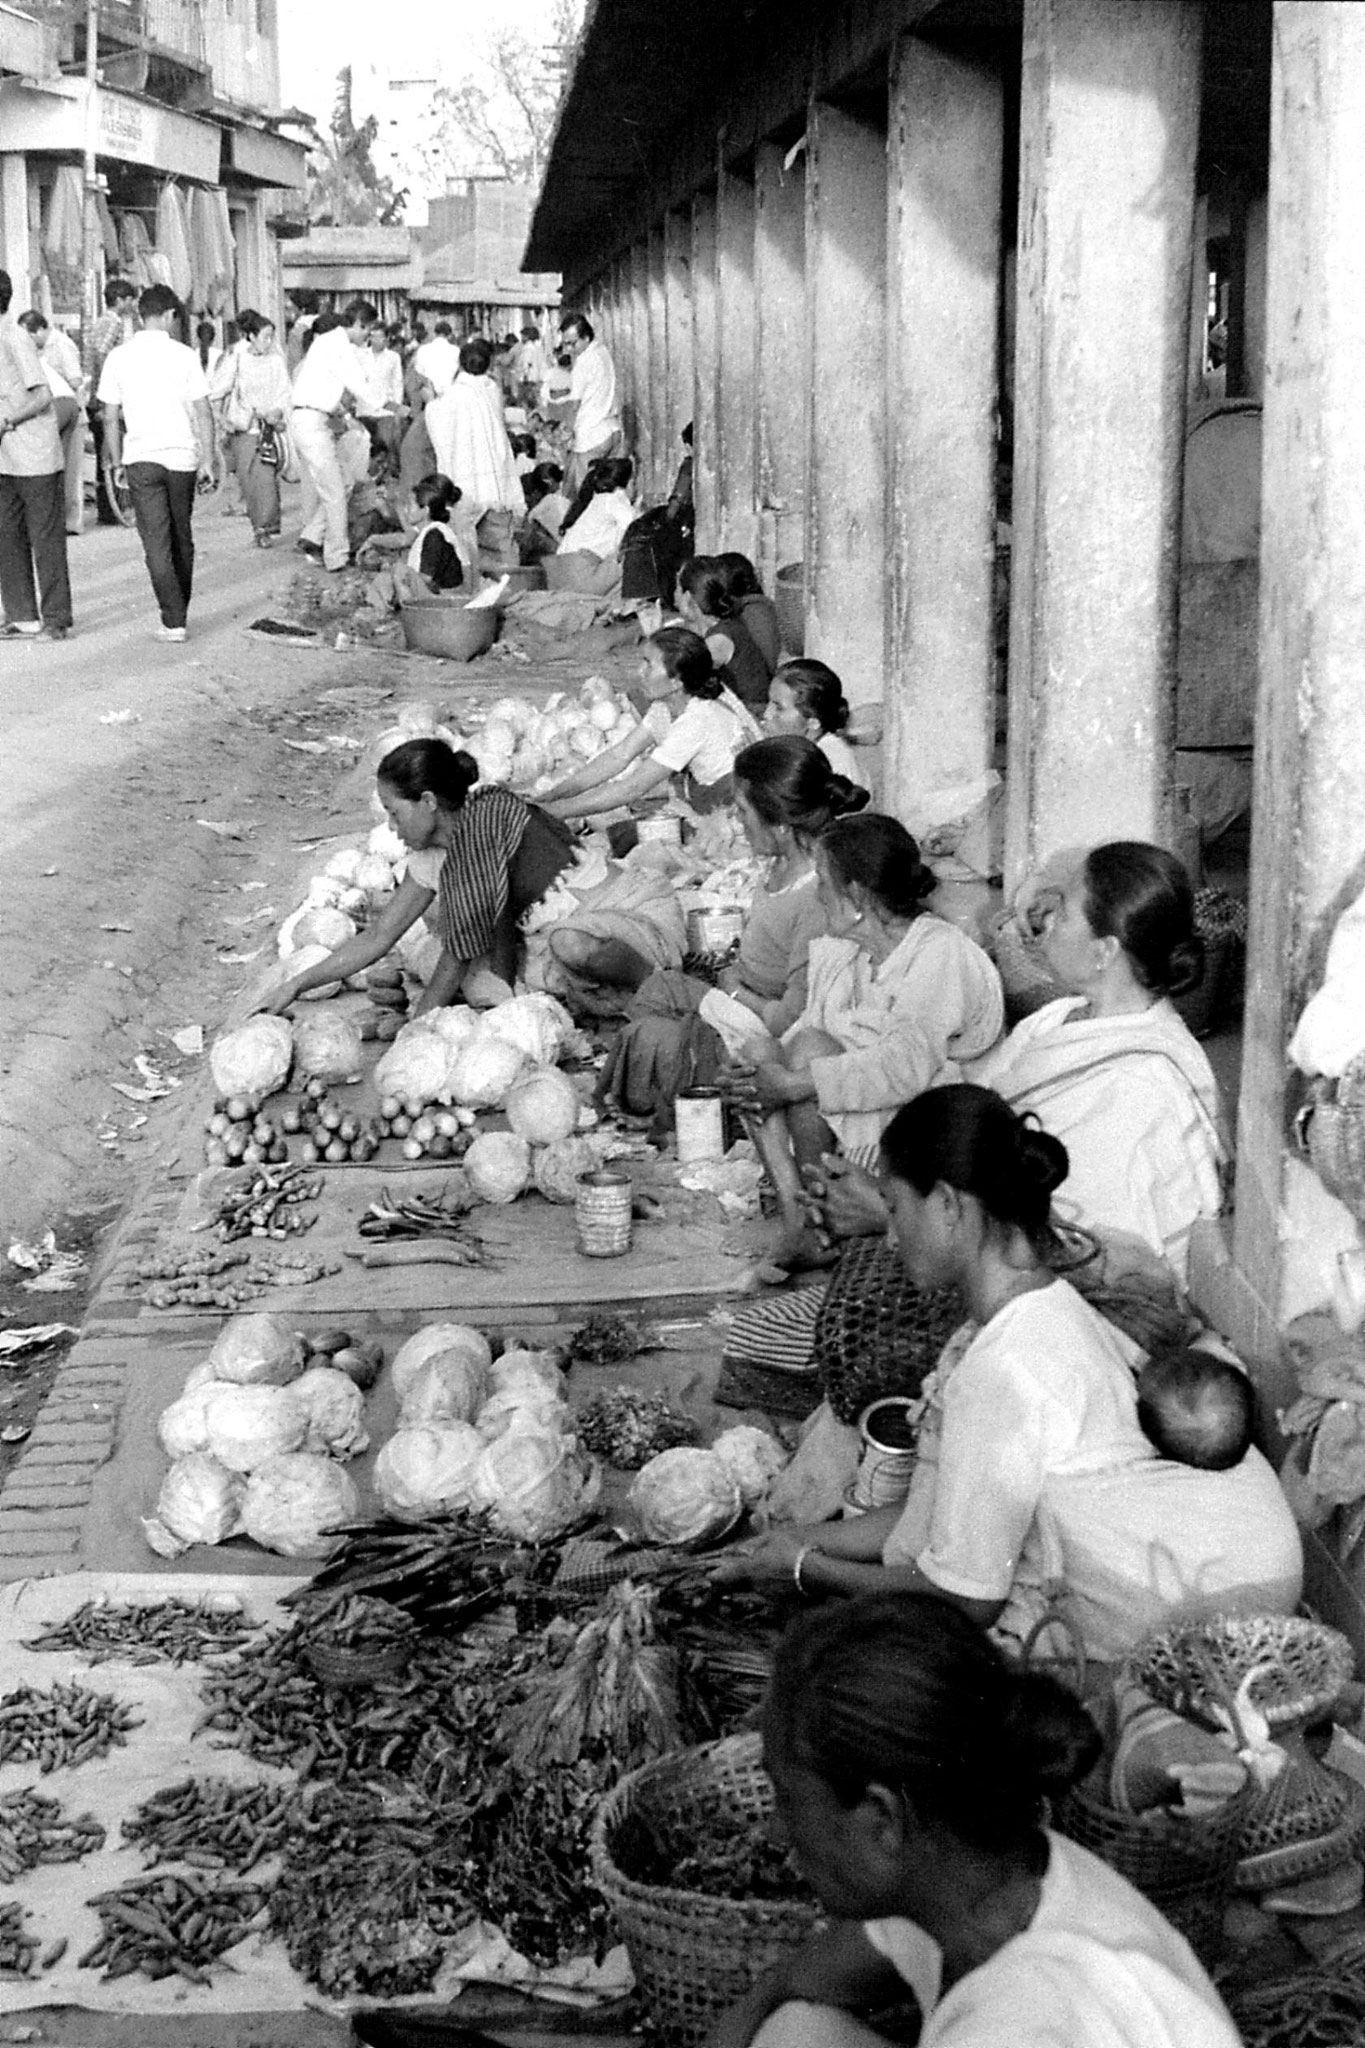 17/4/1990: 14: Imphal women's market